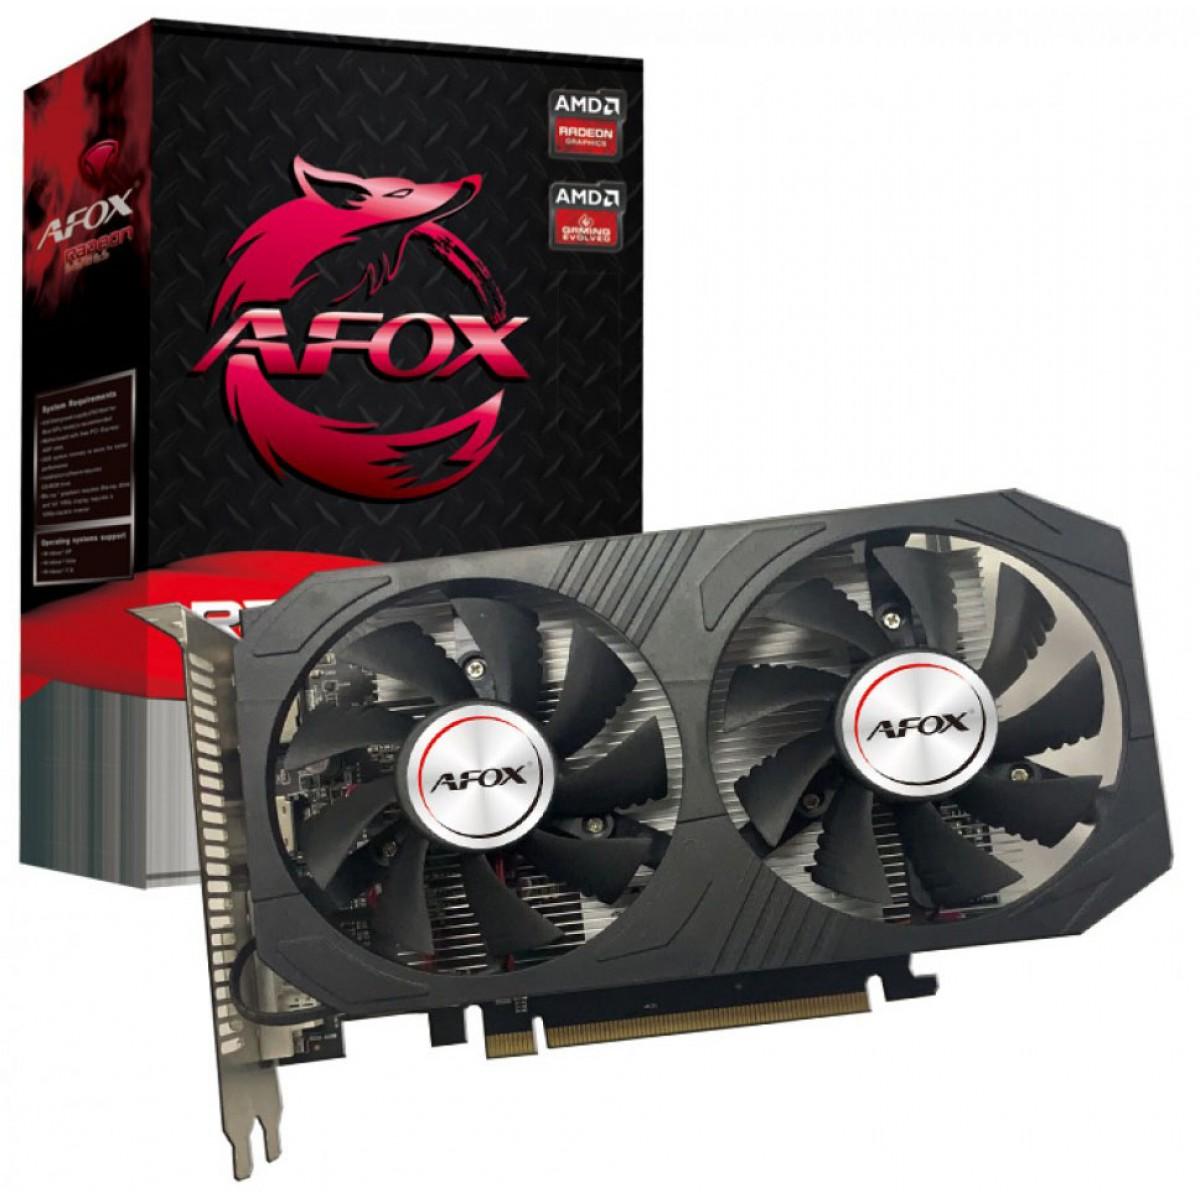 Placa de Video Afox Radeon RX 560 4GB GDDR5 - AFRX560-4096D5H4